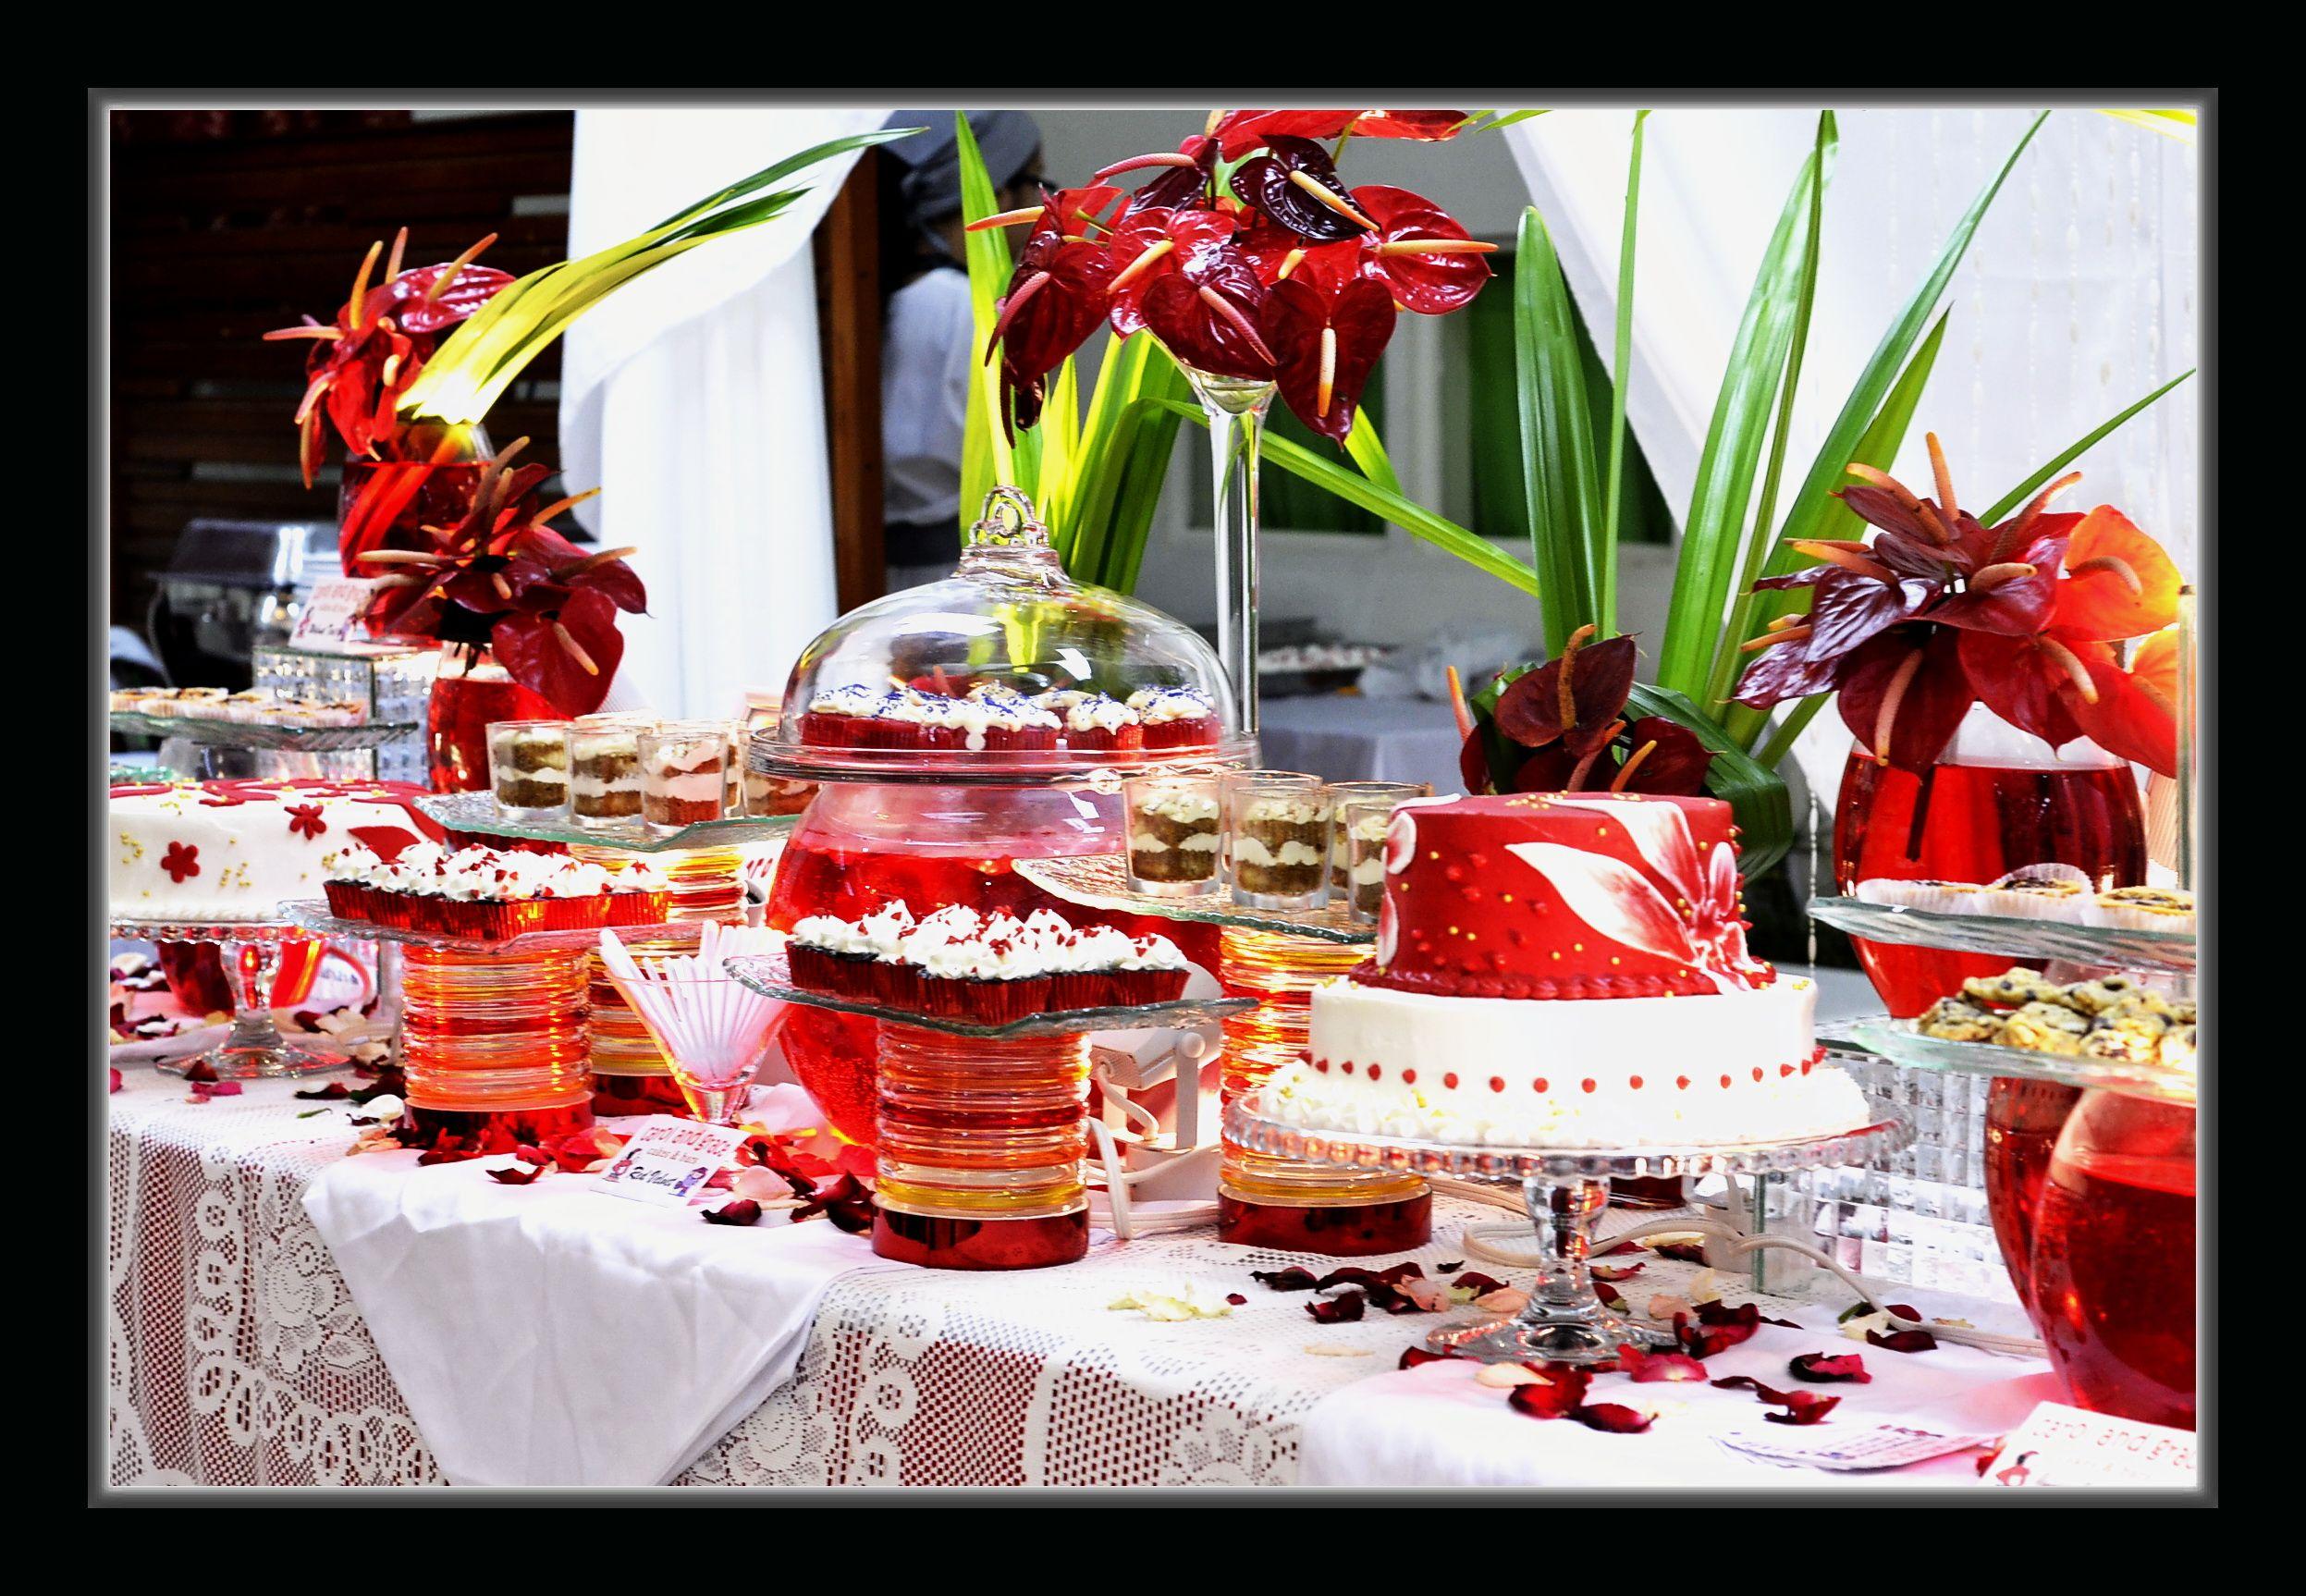 Ruby wedding anniversary dessert buffet by carol and grace